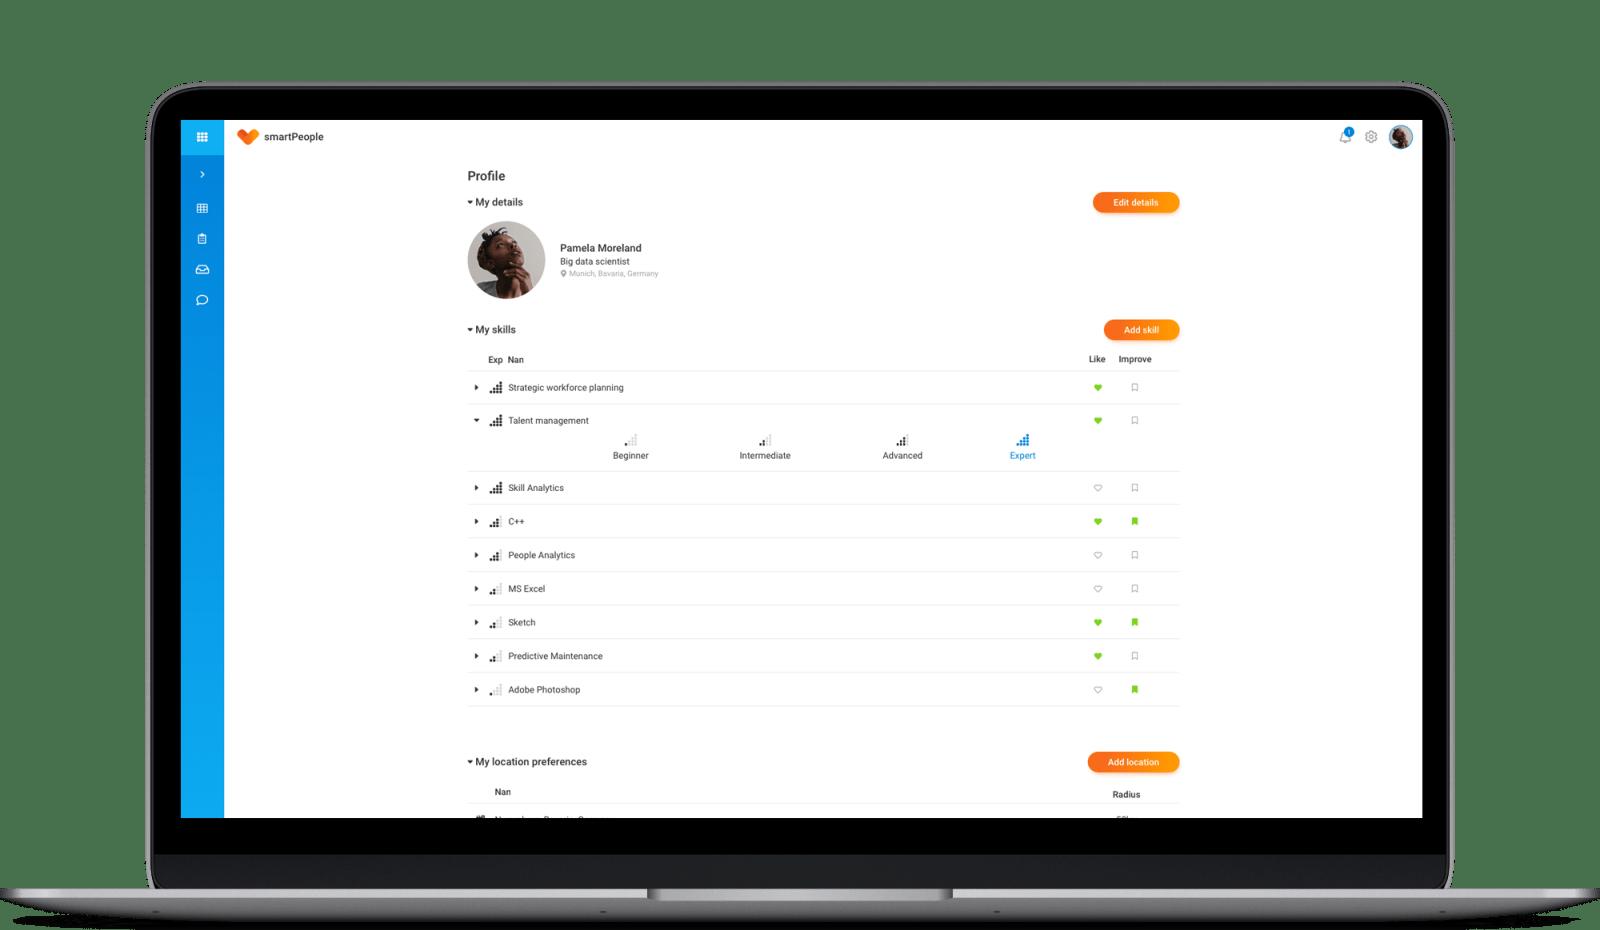 smartPeople profile